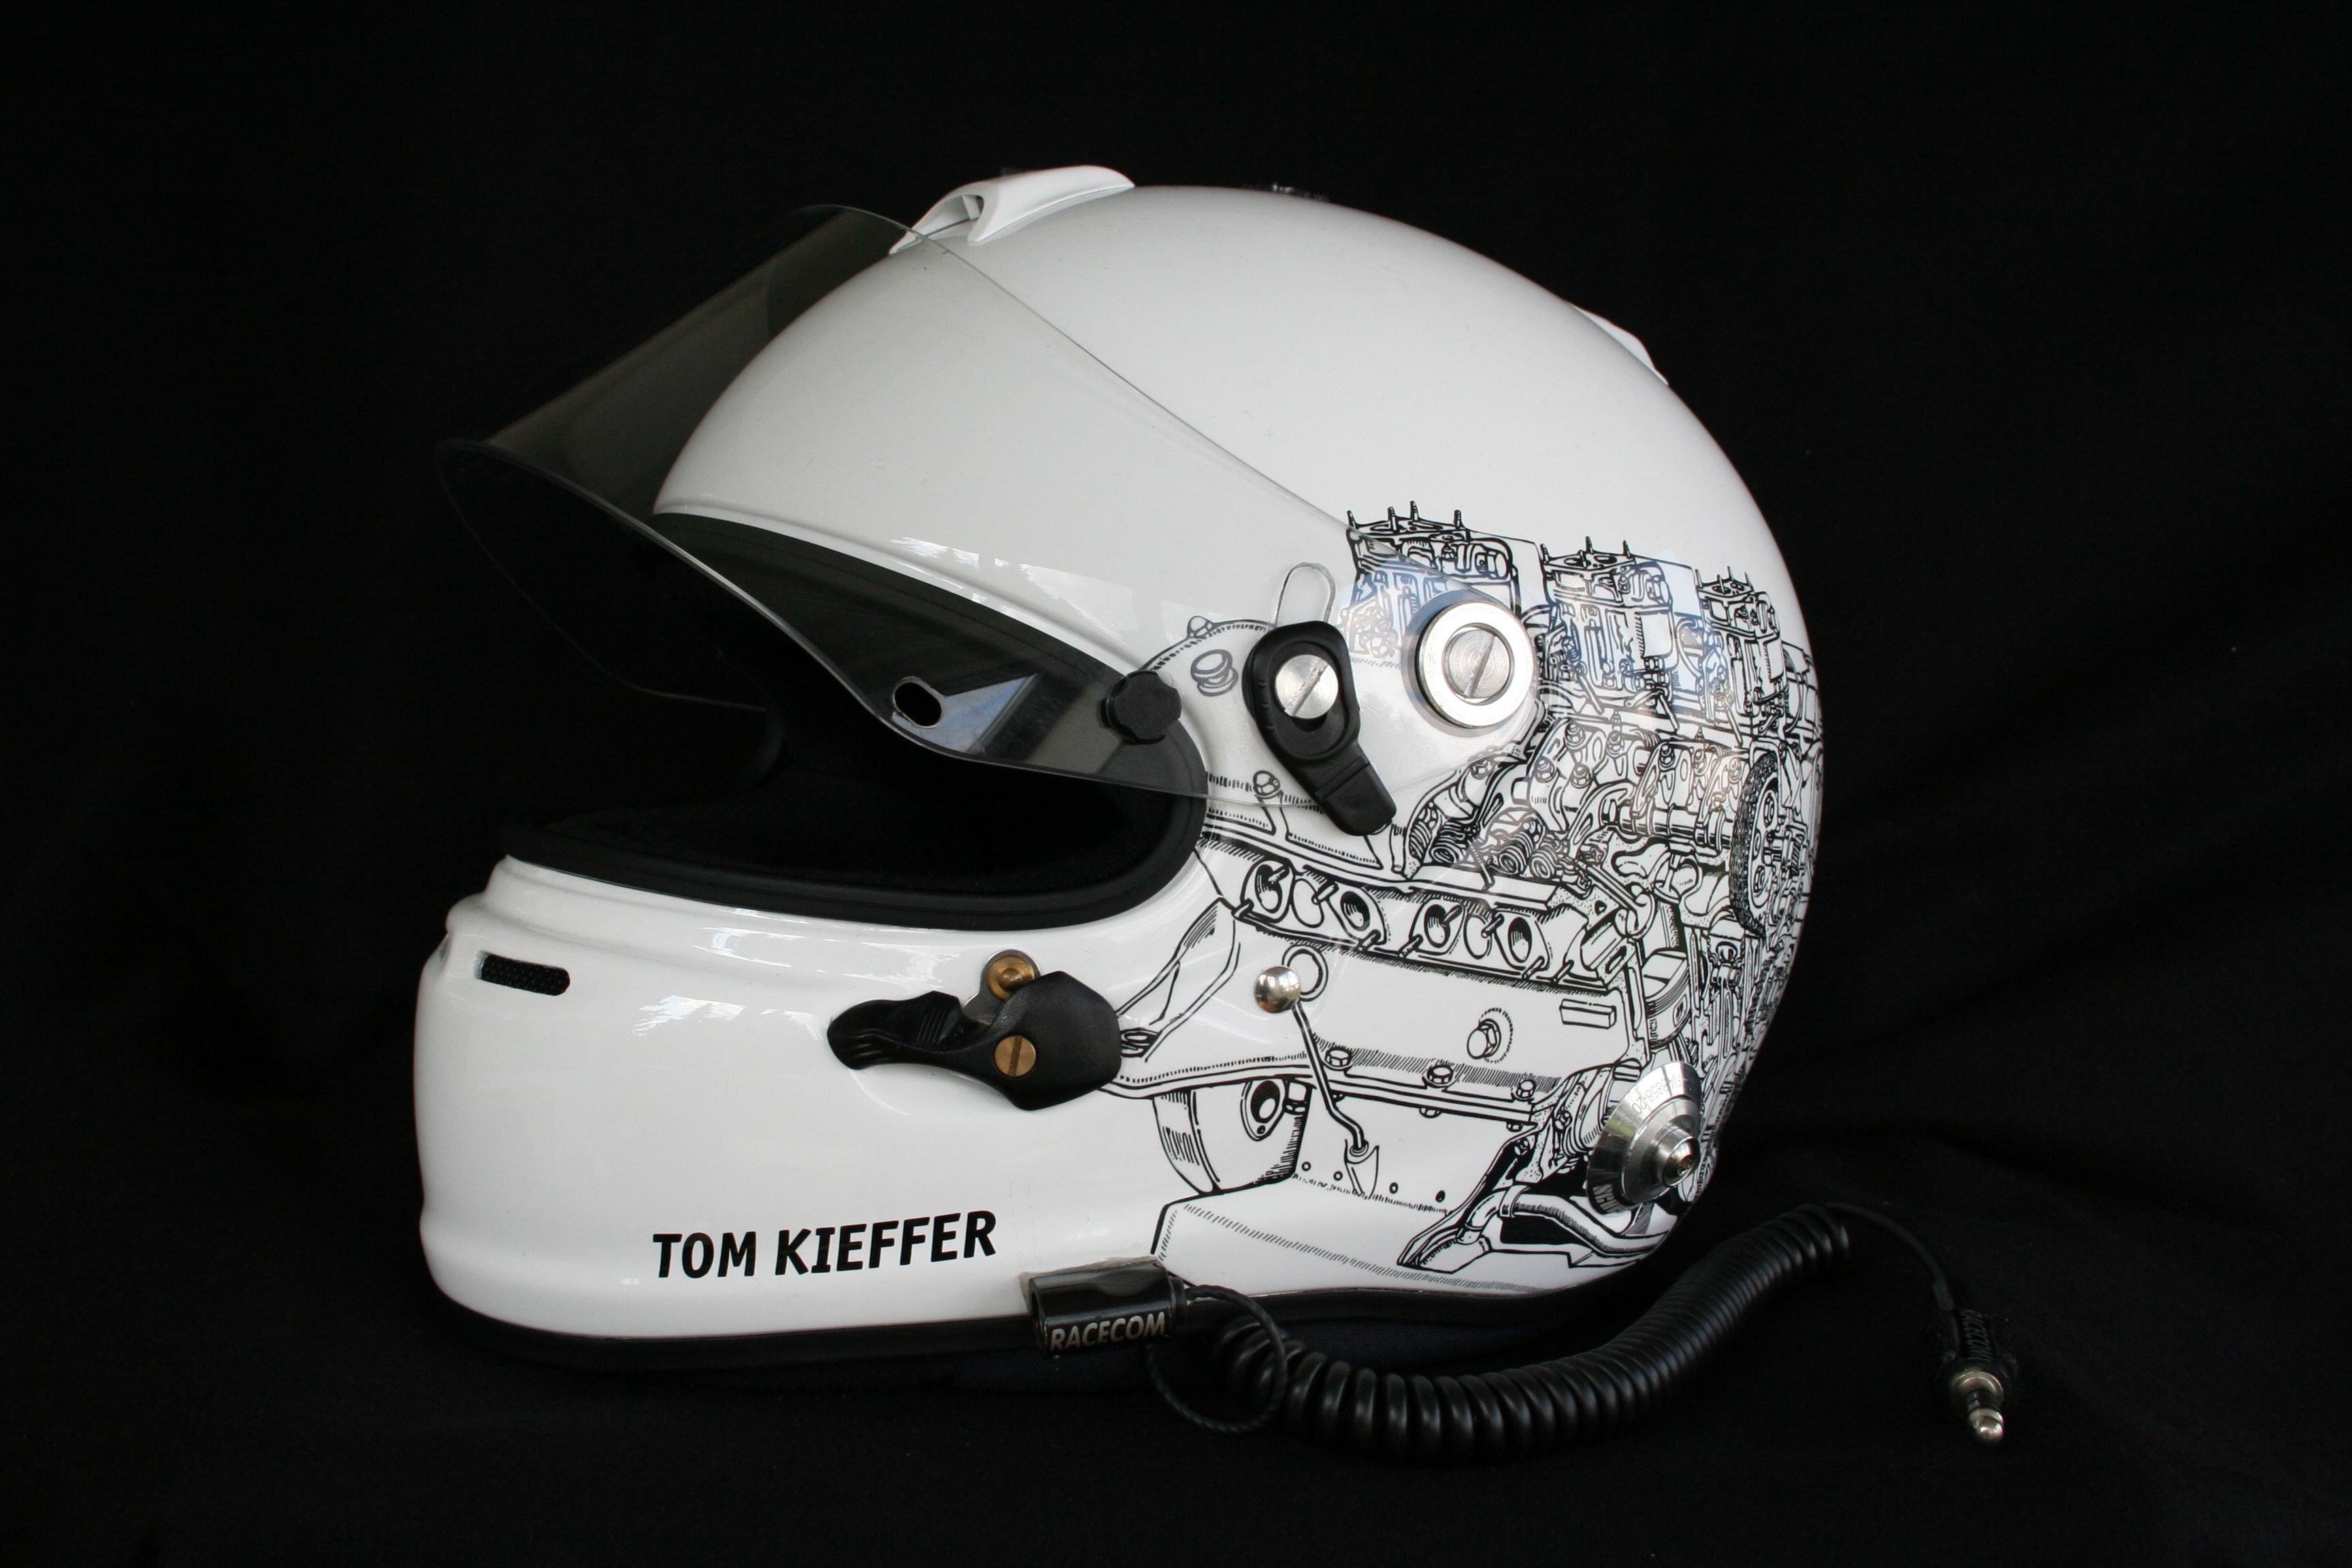 Helmdesign Irace Design